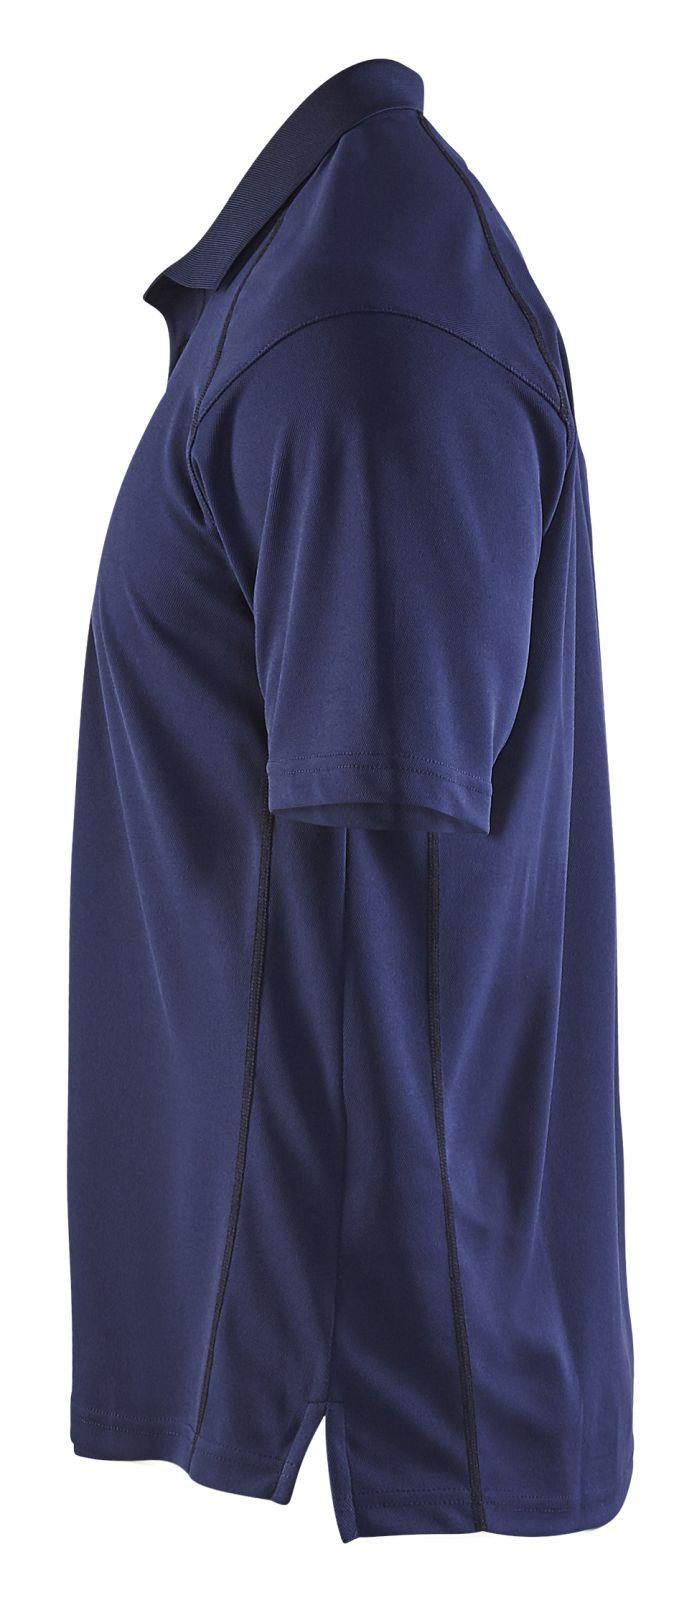 Blaklader Polo shirts 33261051 marineblauw(8900)